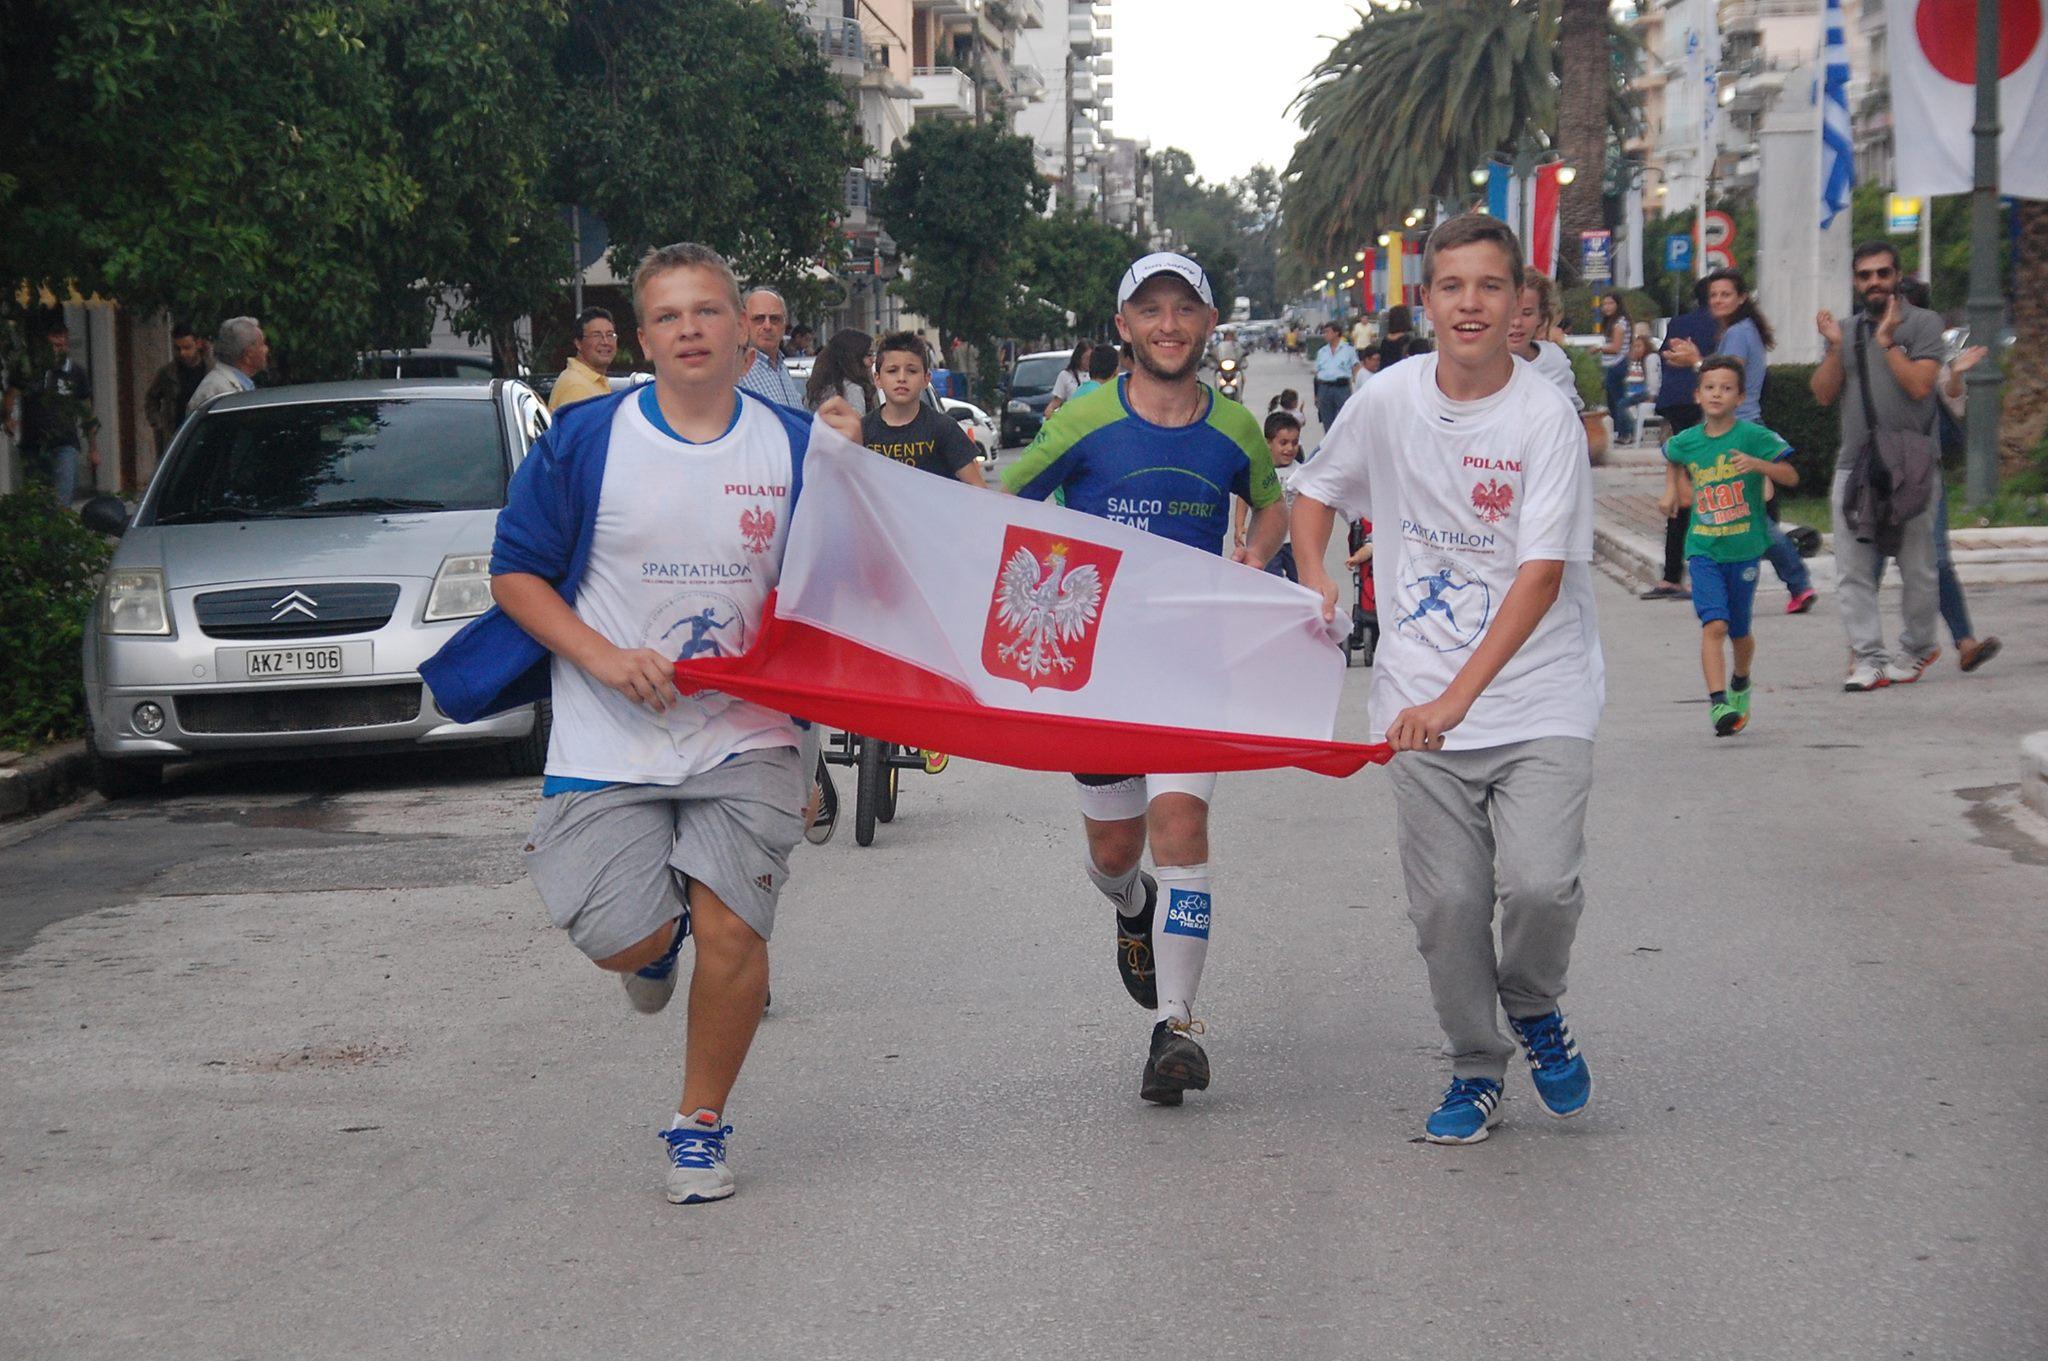 Łukasz Sagan z polską flagą